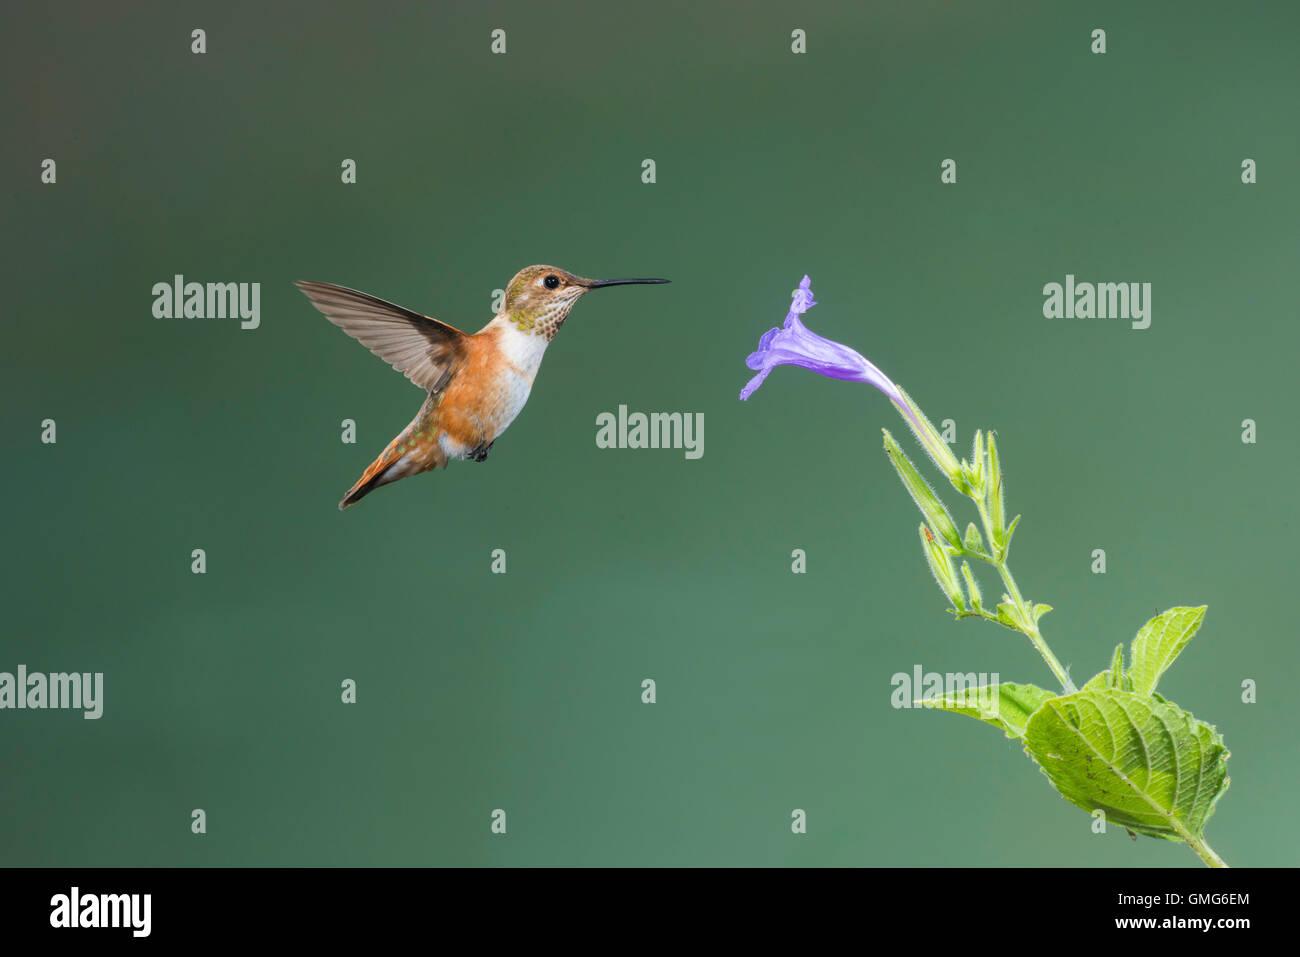 Rufous Hummingbird  Selasphorus rufus Tucson, Pima County, Arizona, United States 25 August     Immature Male   - Stock Image